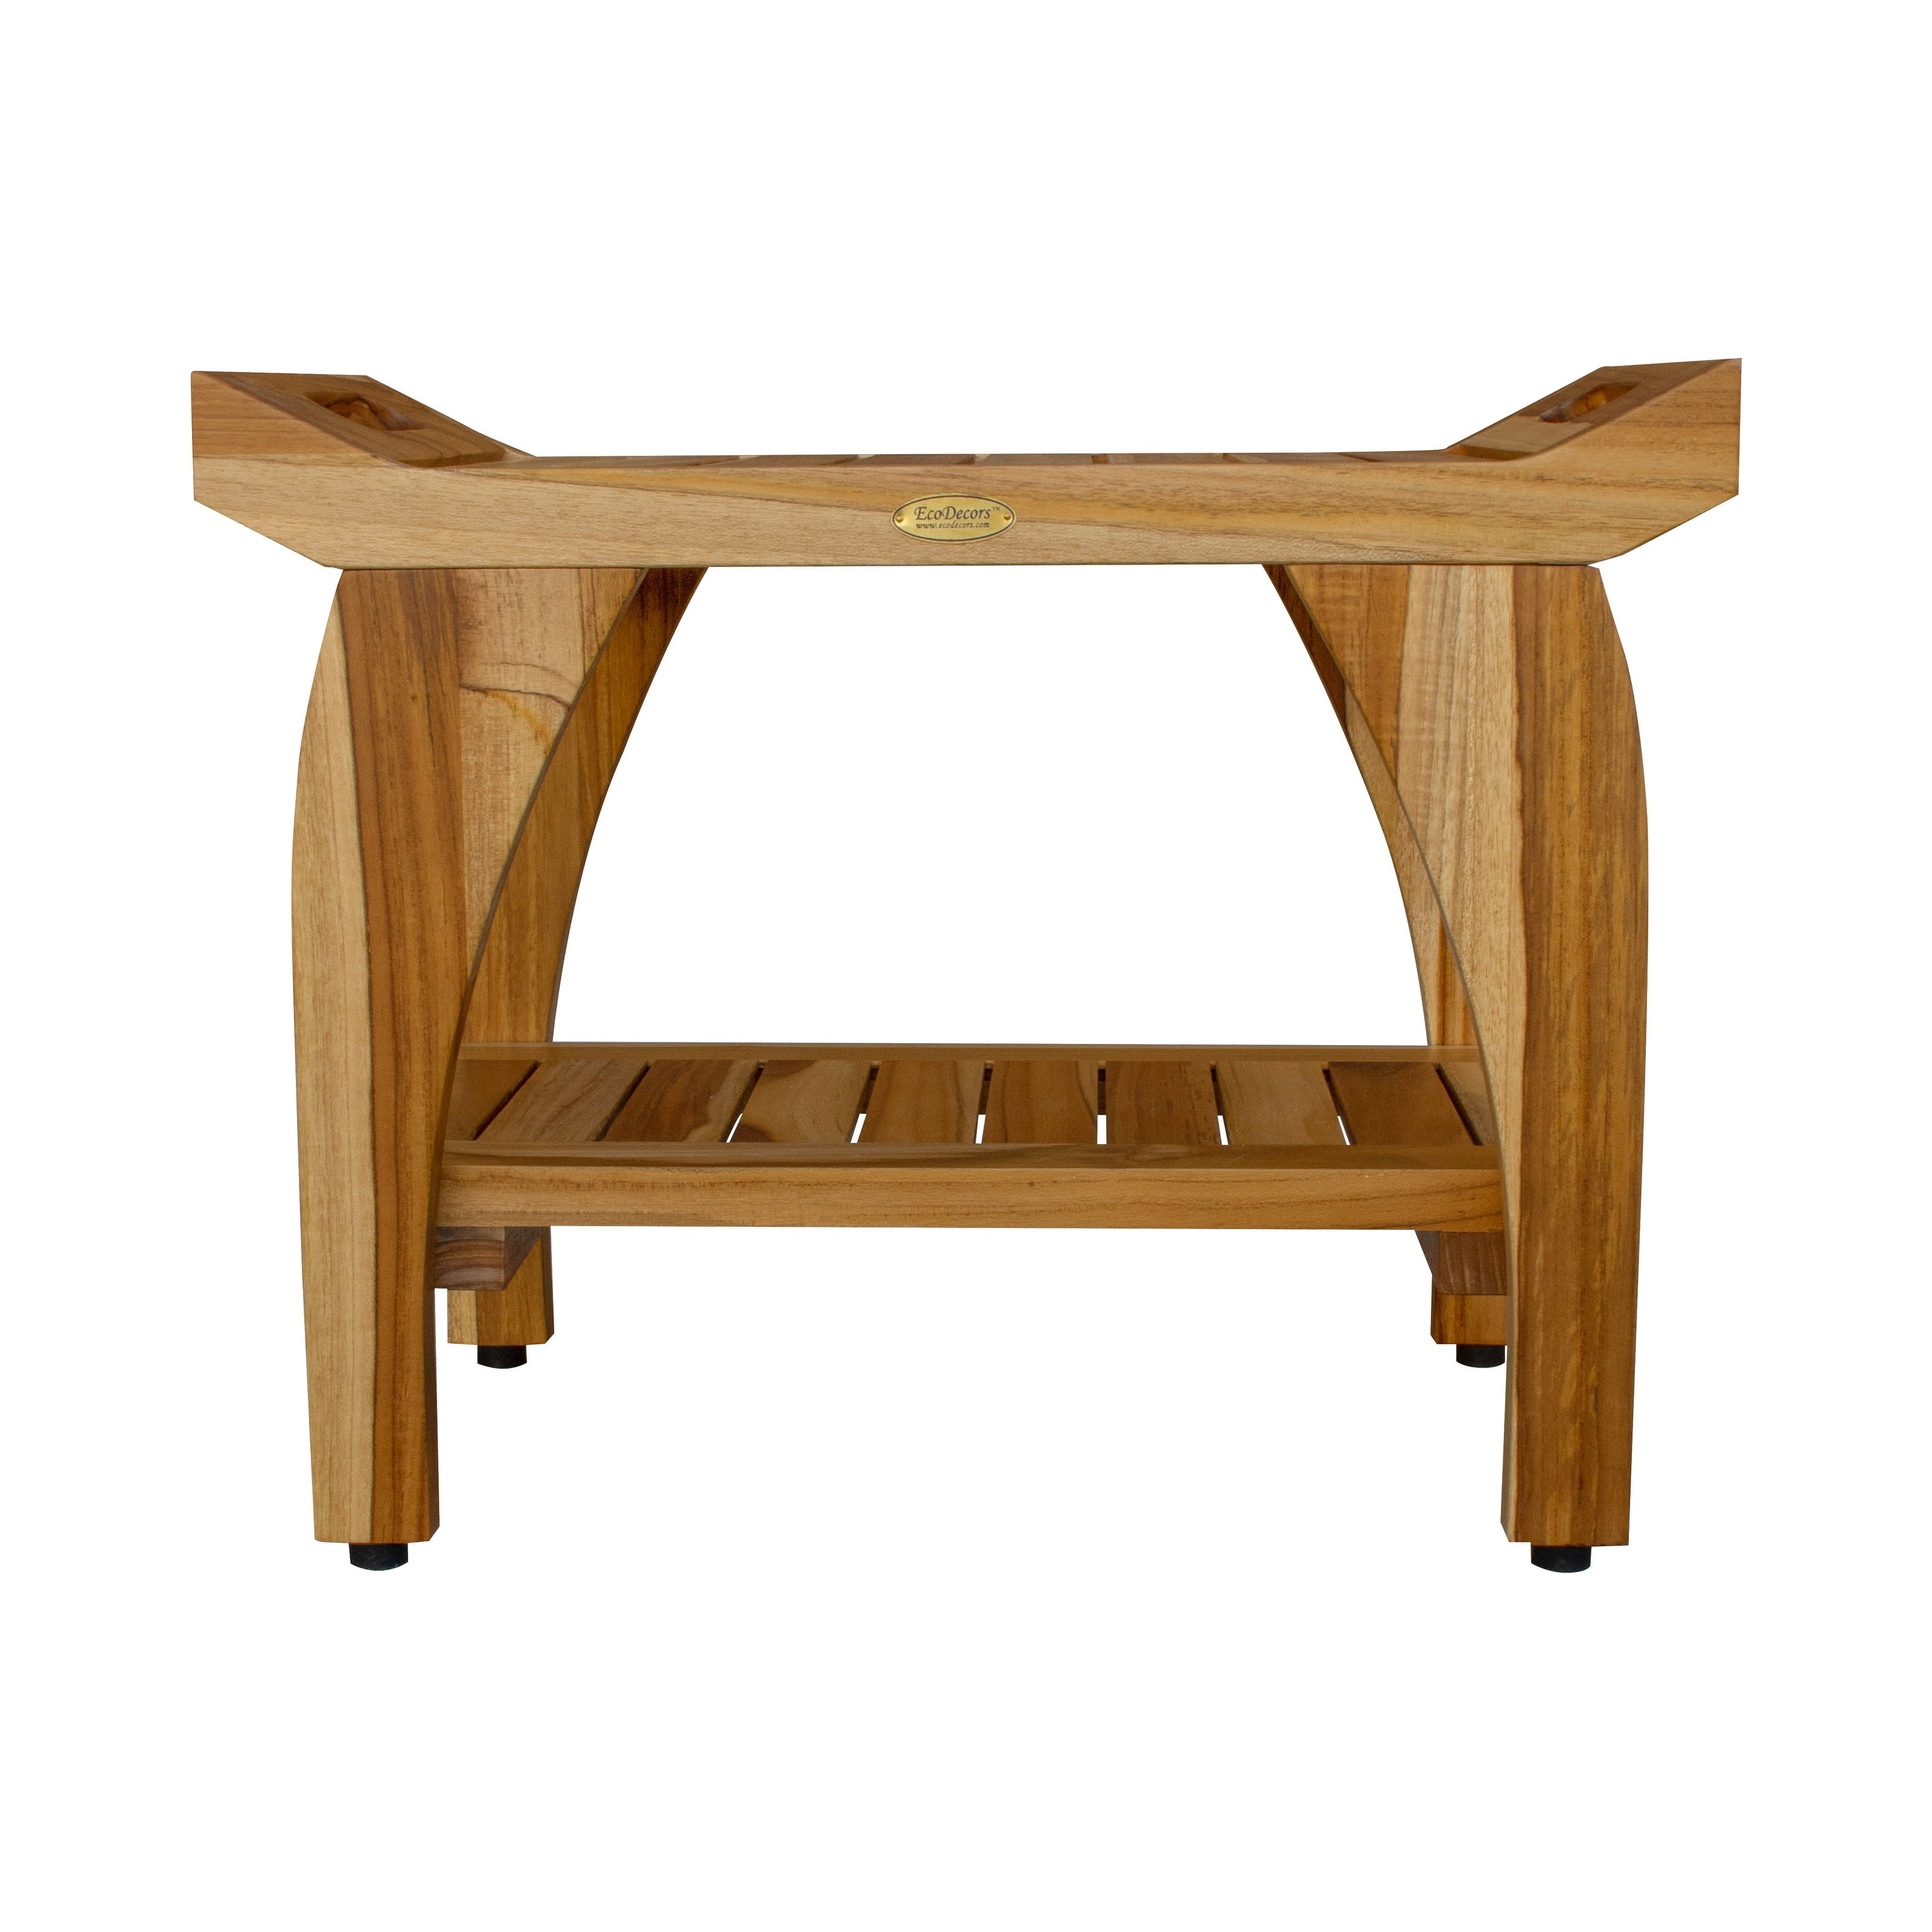 24 Ecodecors Earthyteak Tranquility Solid Teak Shower Bench With Shelf Earthyteak Finish Overstock 28301077